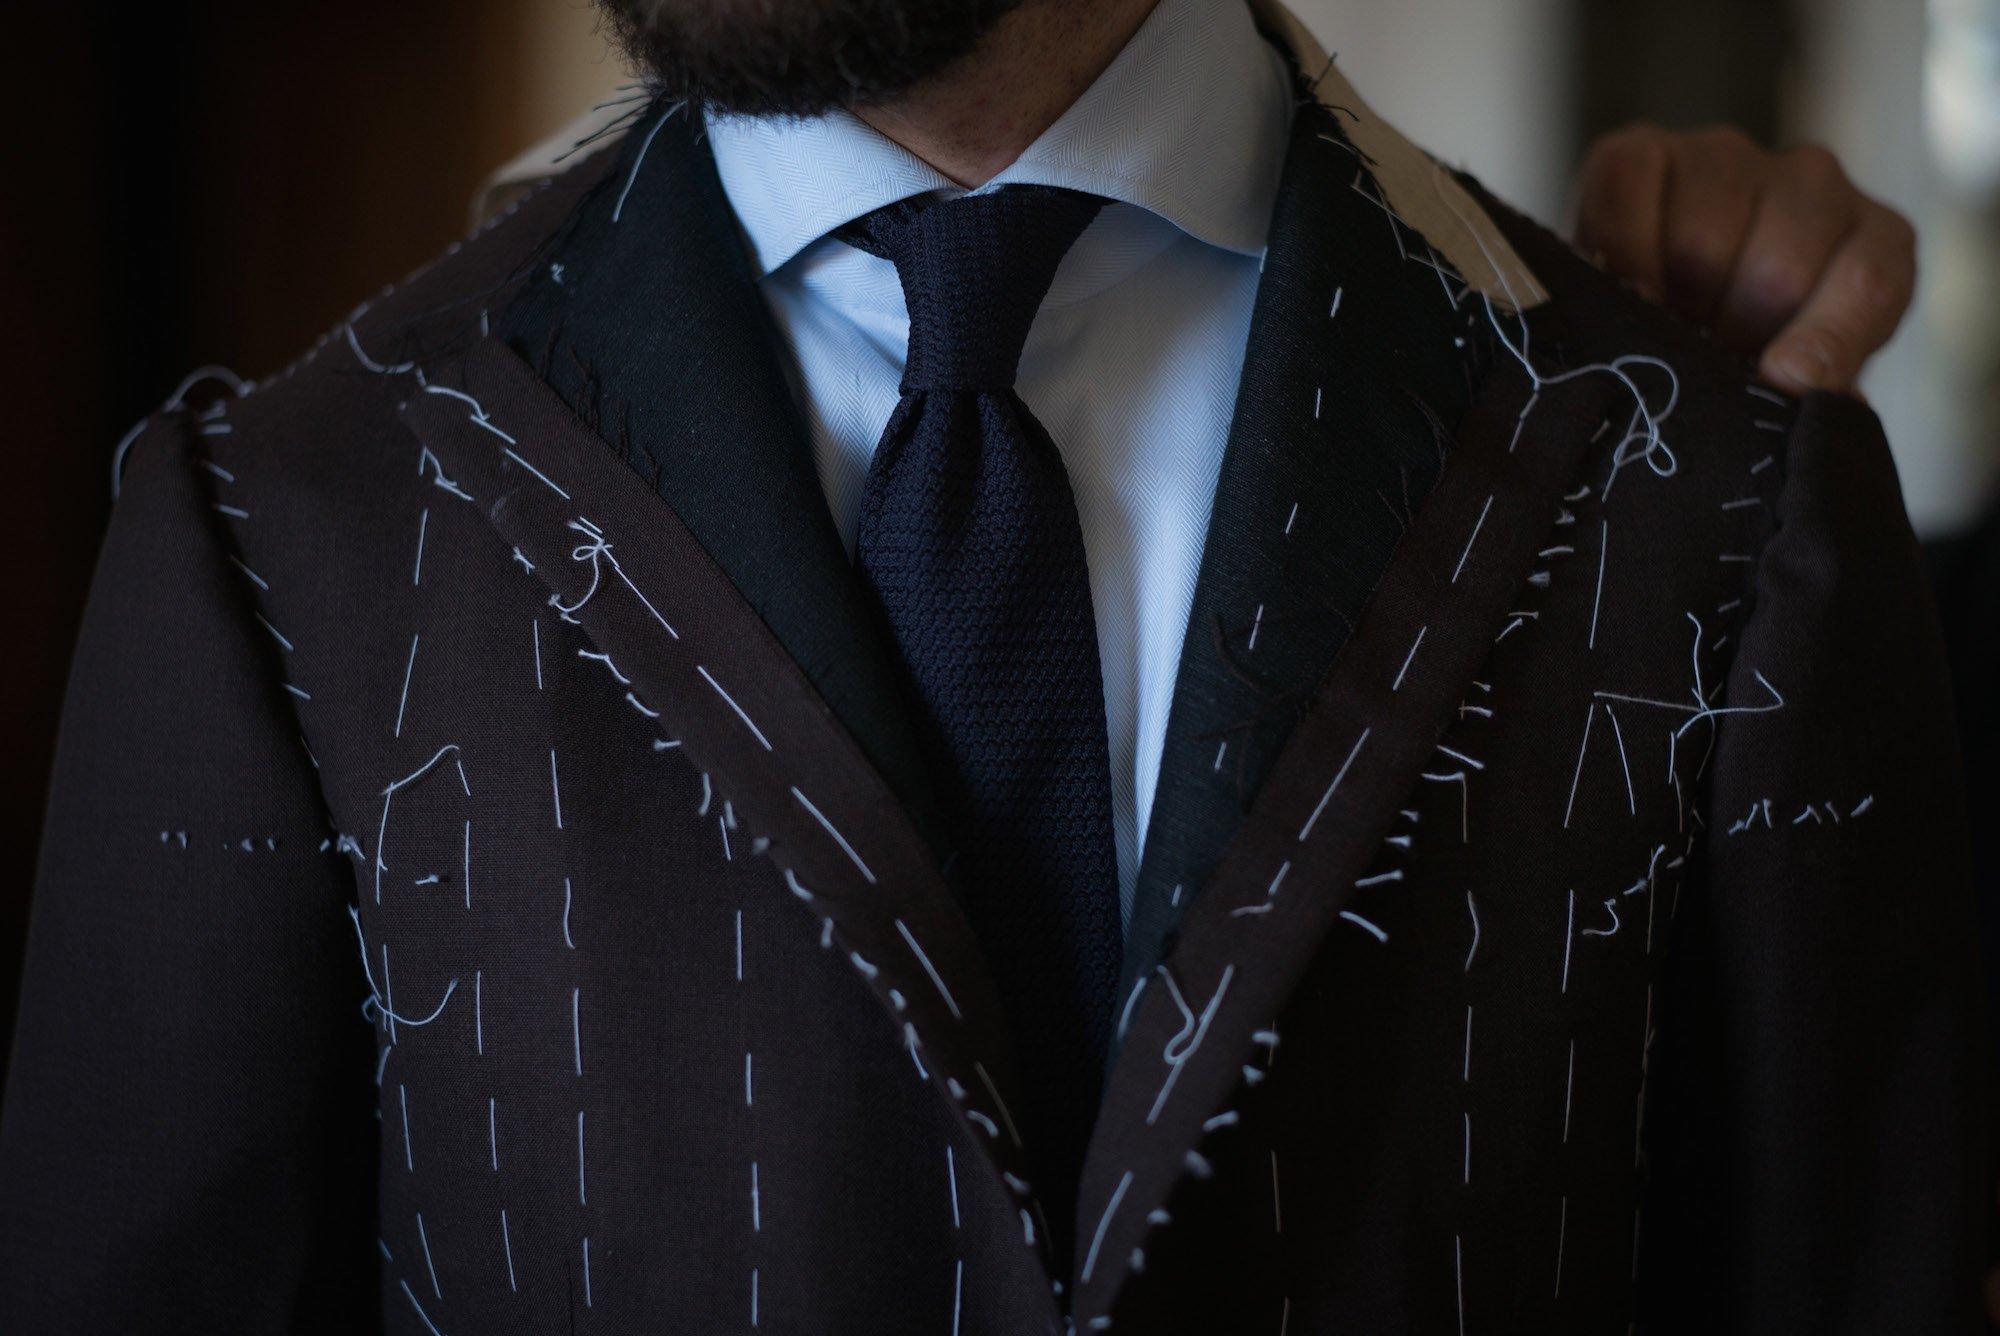 bespoke suits sartoria dalcuore naples bespoke suit nzkwdyl